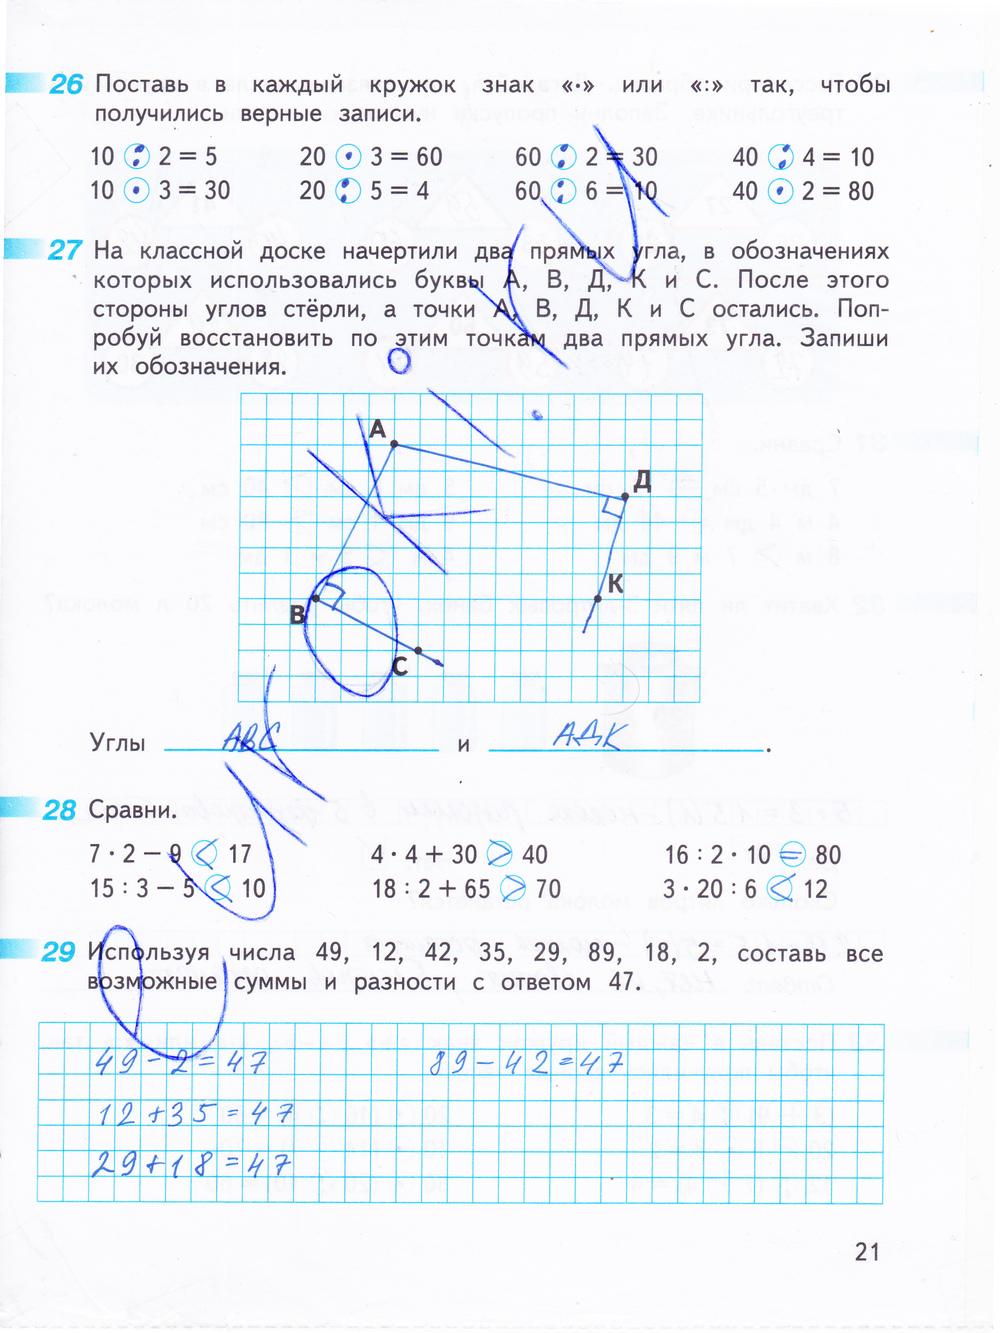 Гдз По Математике 3 Класс Страница 21 Номер